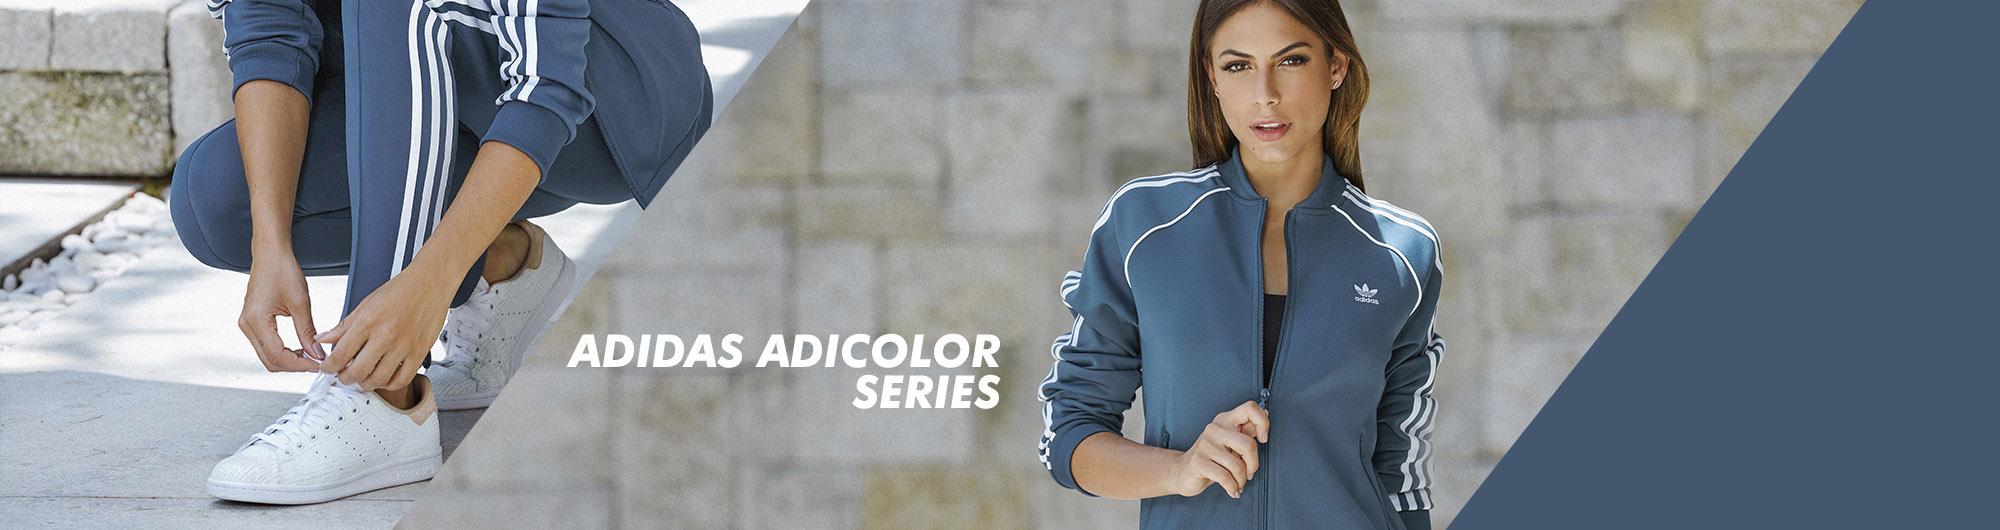 BTV1-adidas_Adicolor_Series